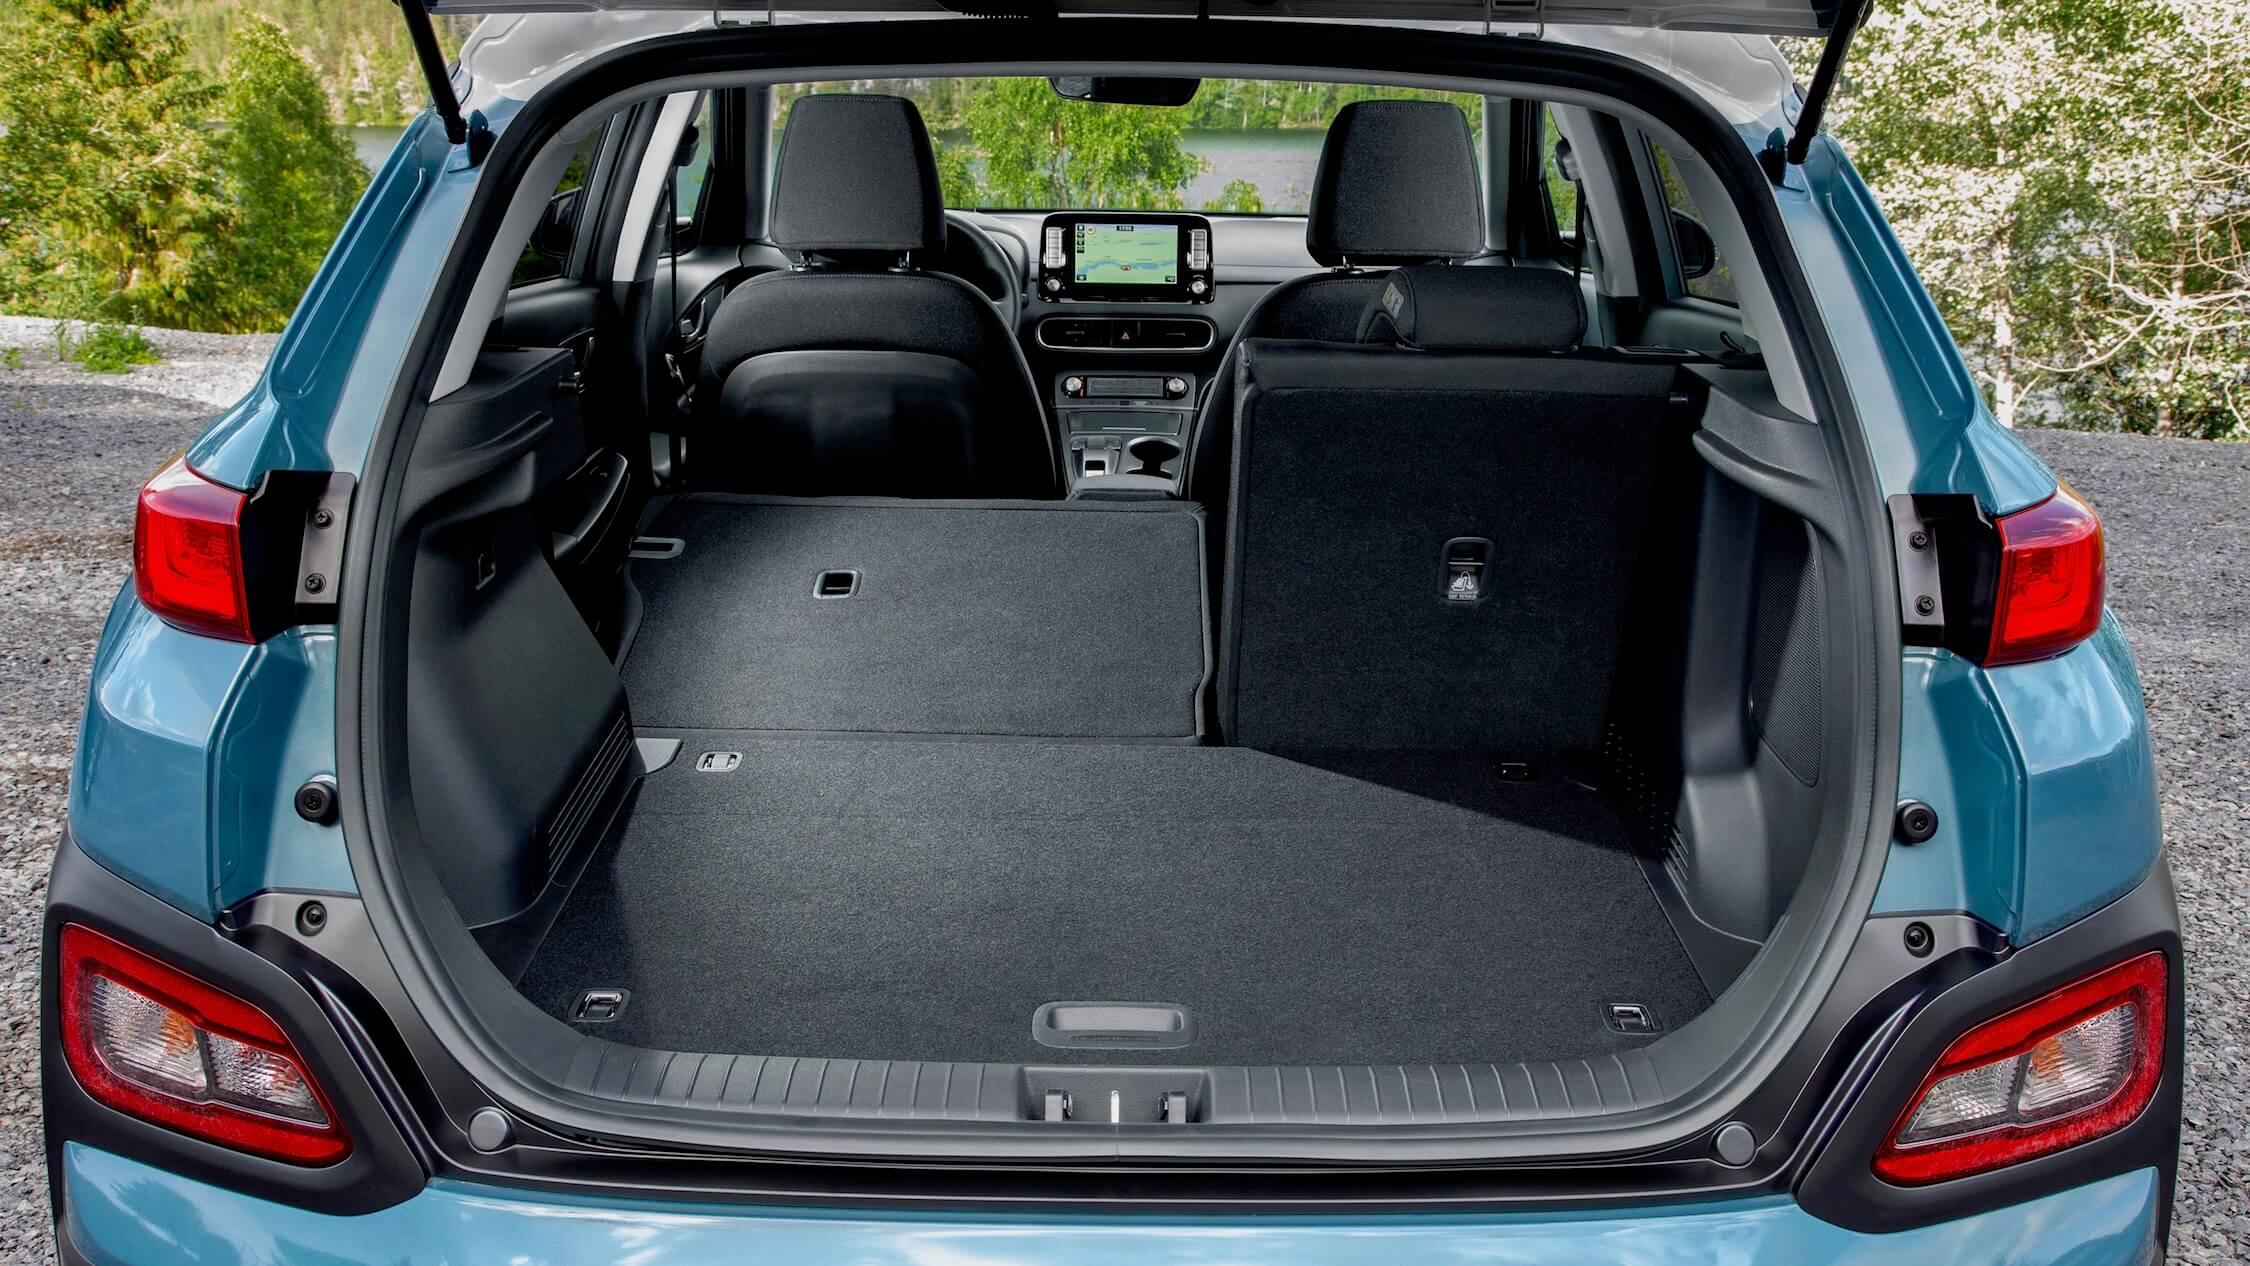 Hyundai Kona EV koffer zetels neer